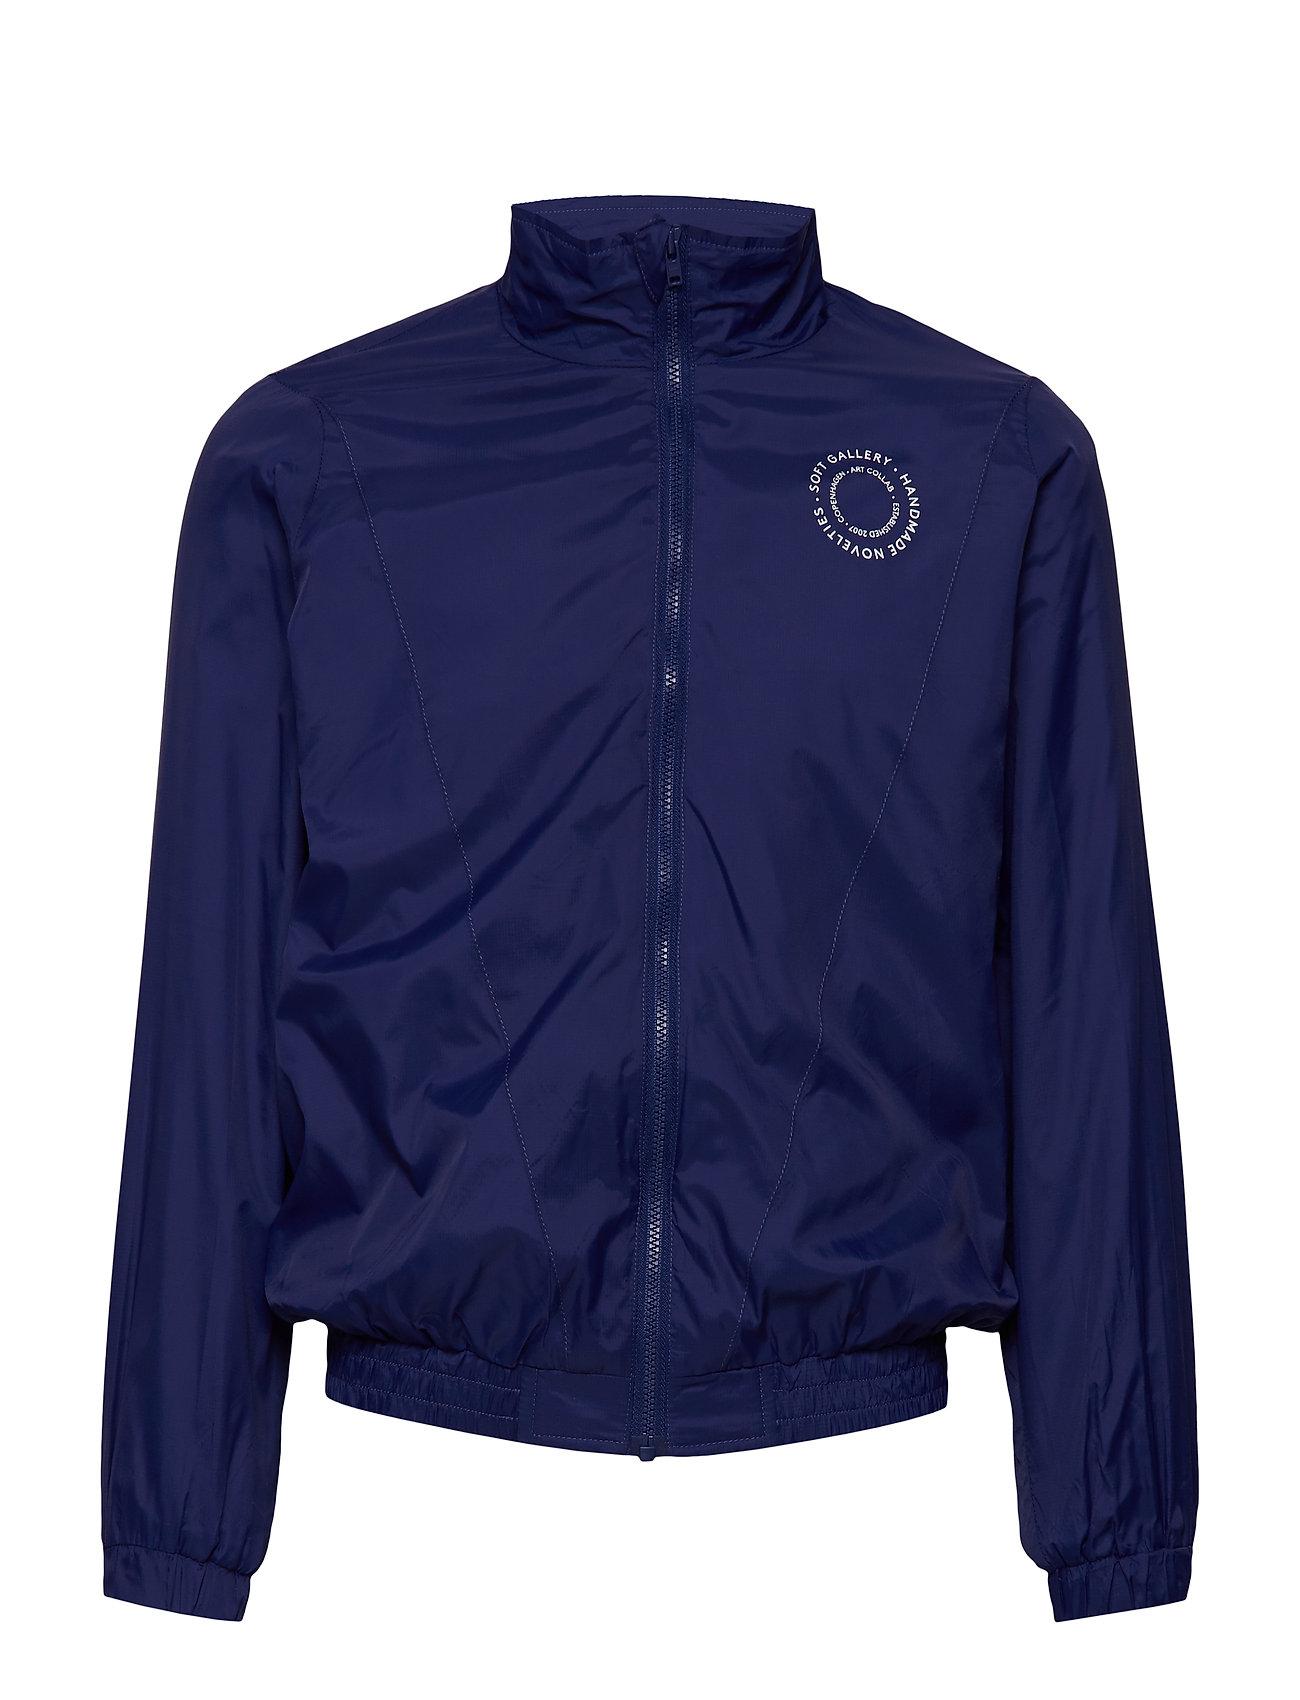 Soft Gallery Dixon Jacket - DRESS BLUE, CREAM LOGO